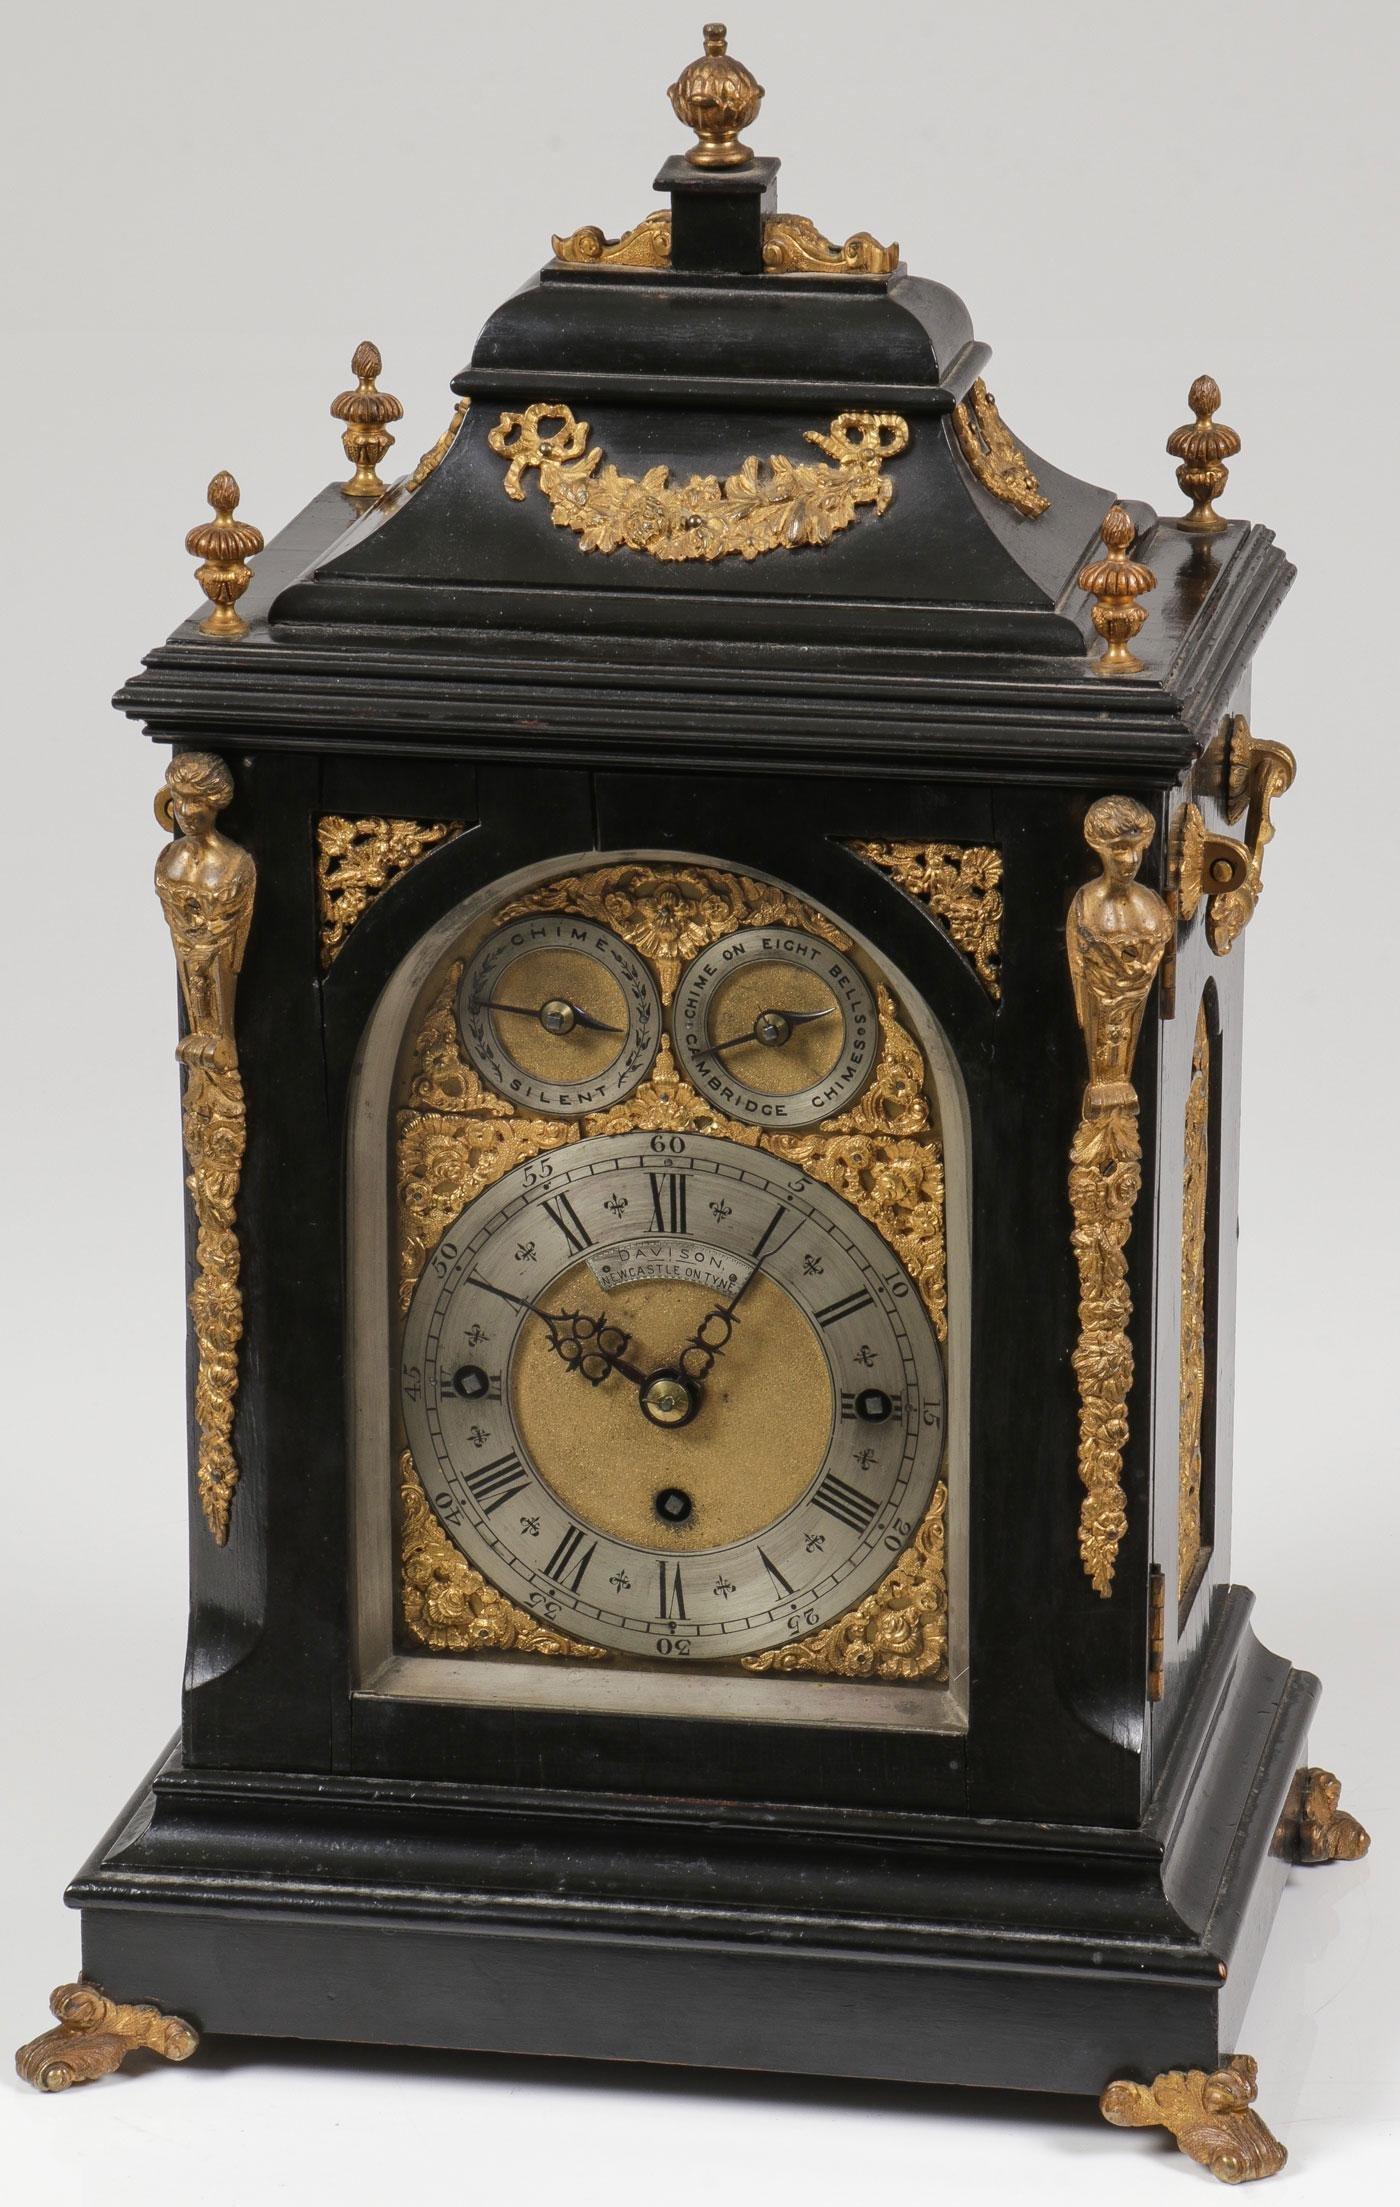 FINE ENGLISH BRACKET CLOCK, 19TH C